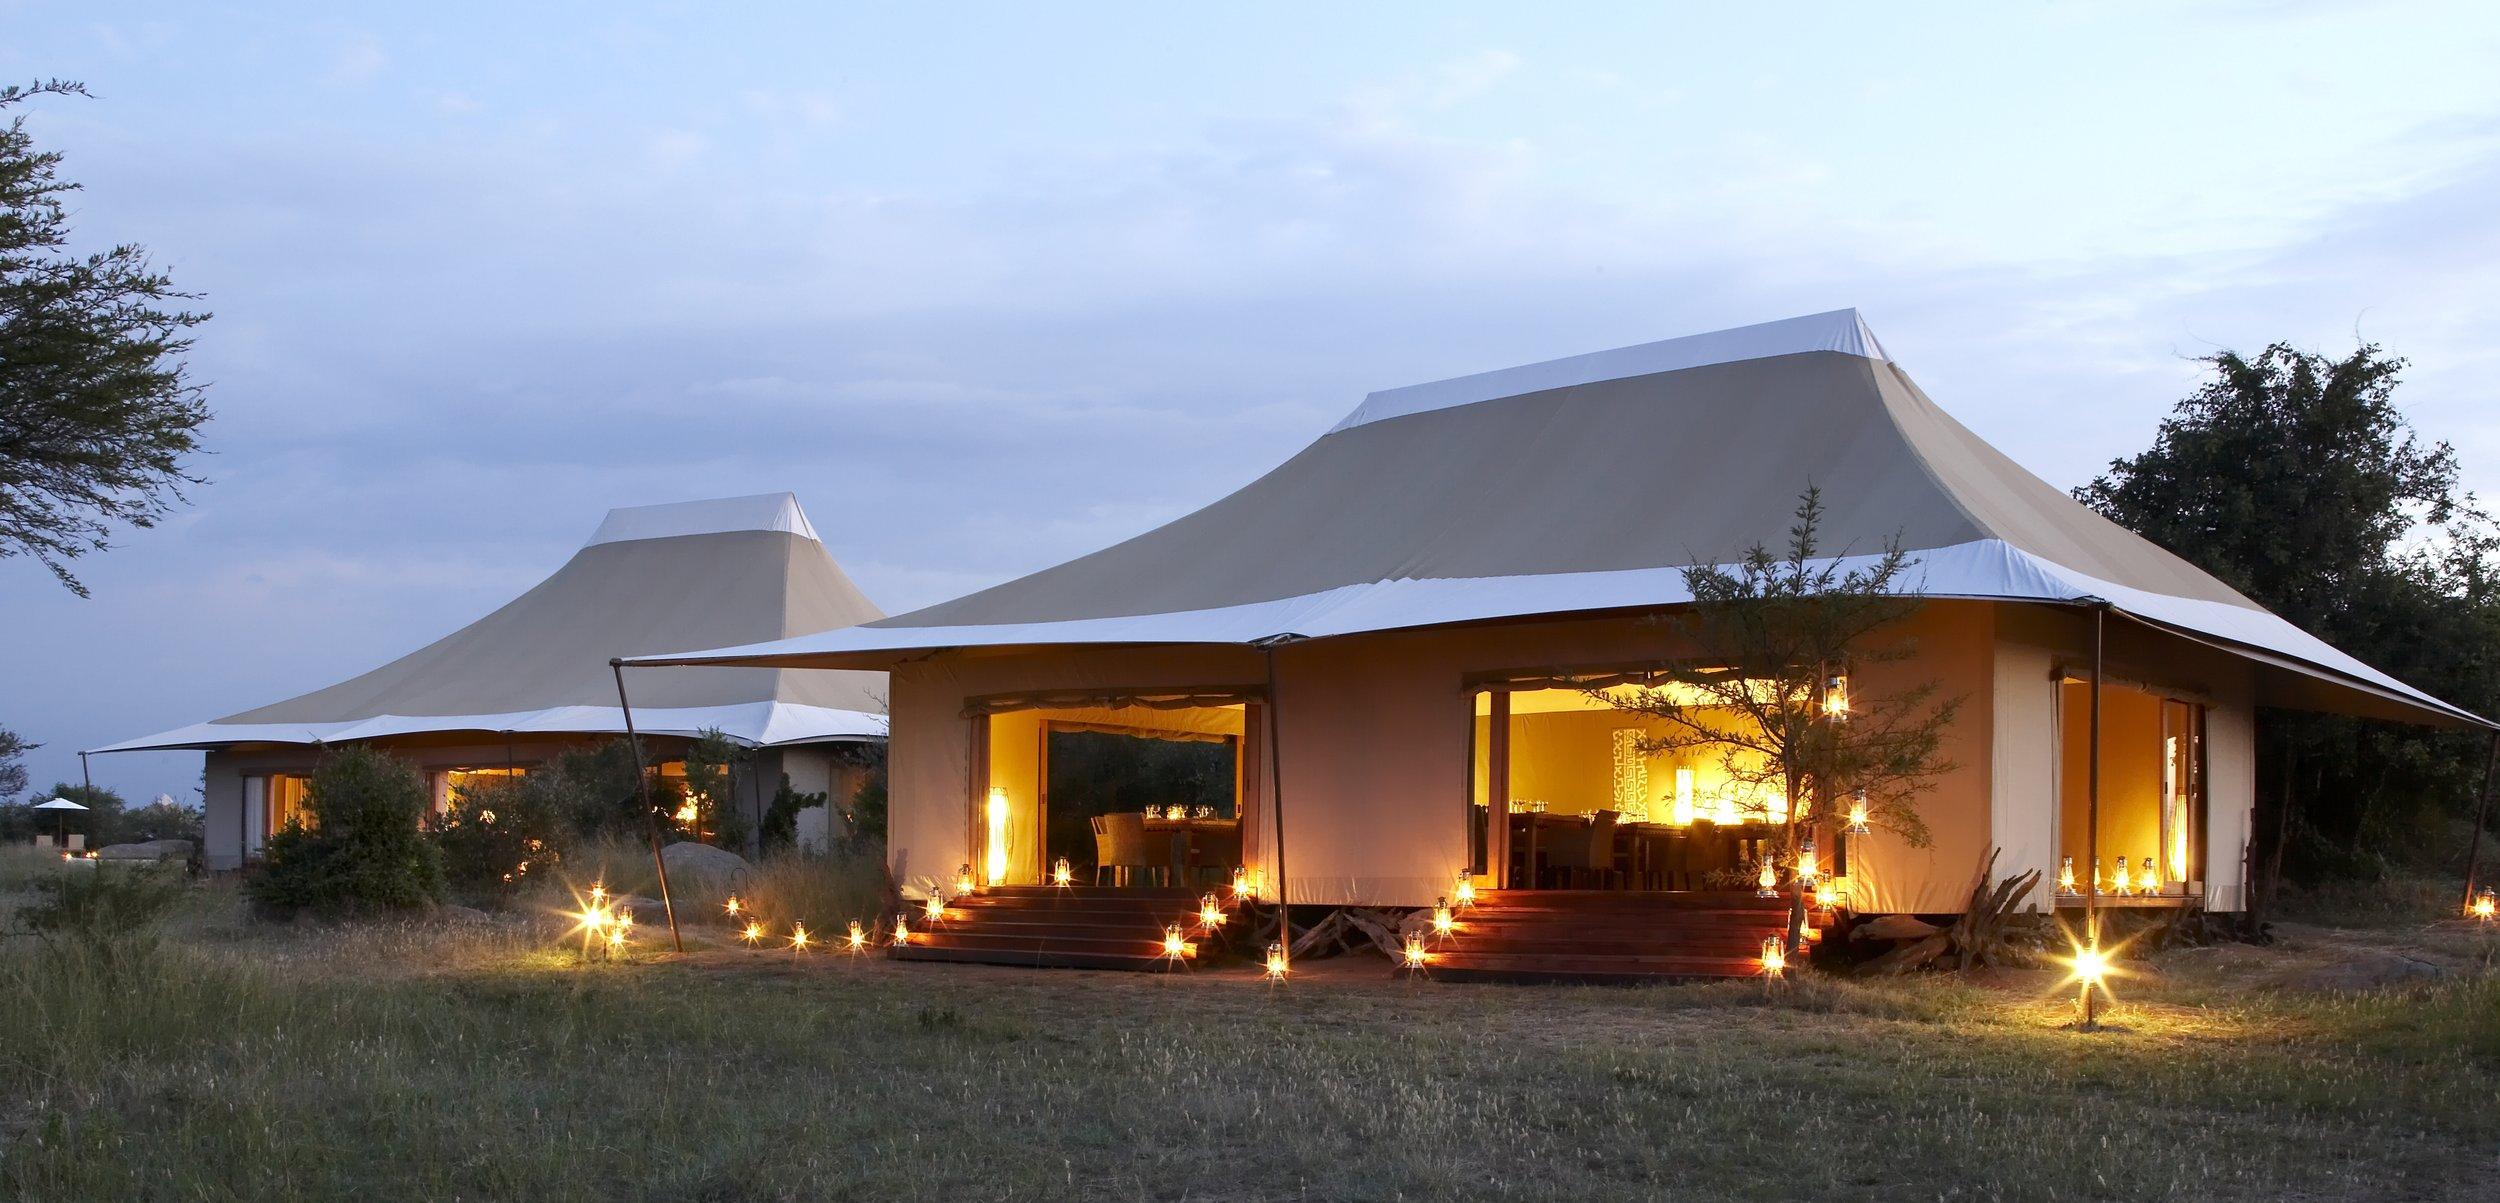 Sayari-Camp-Dining-room-exterior.JPG